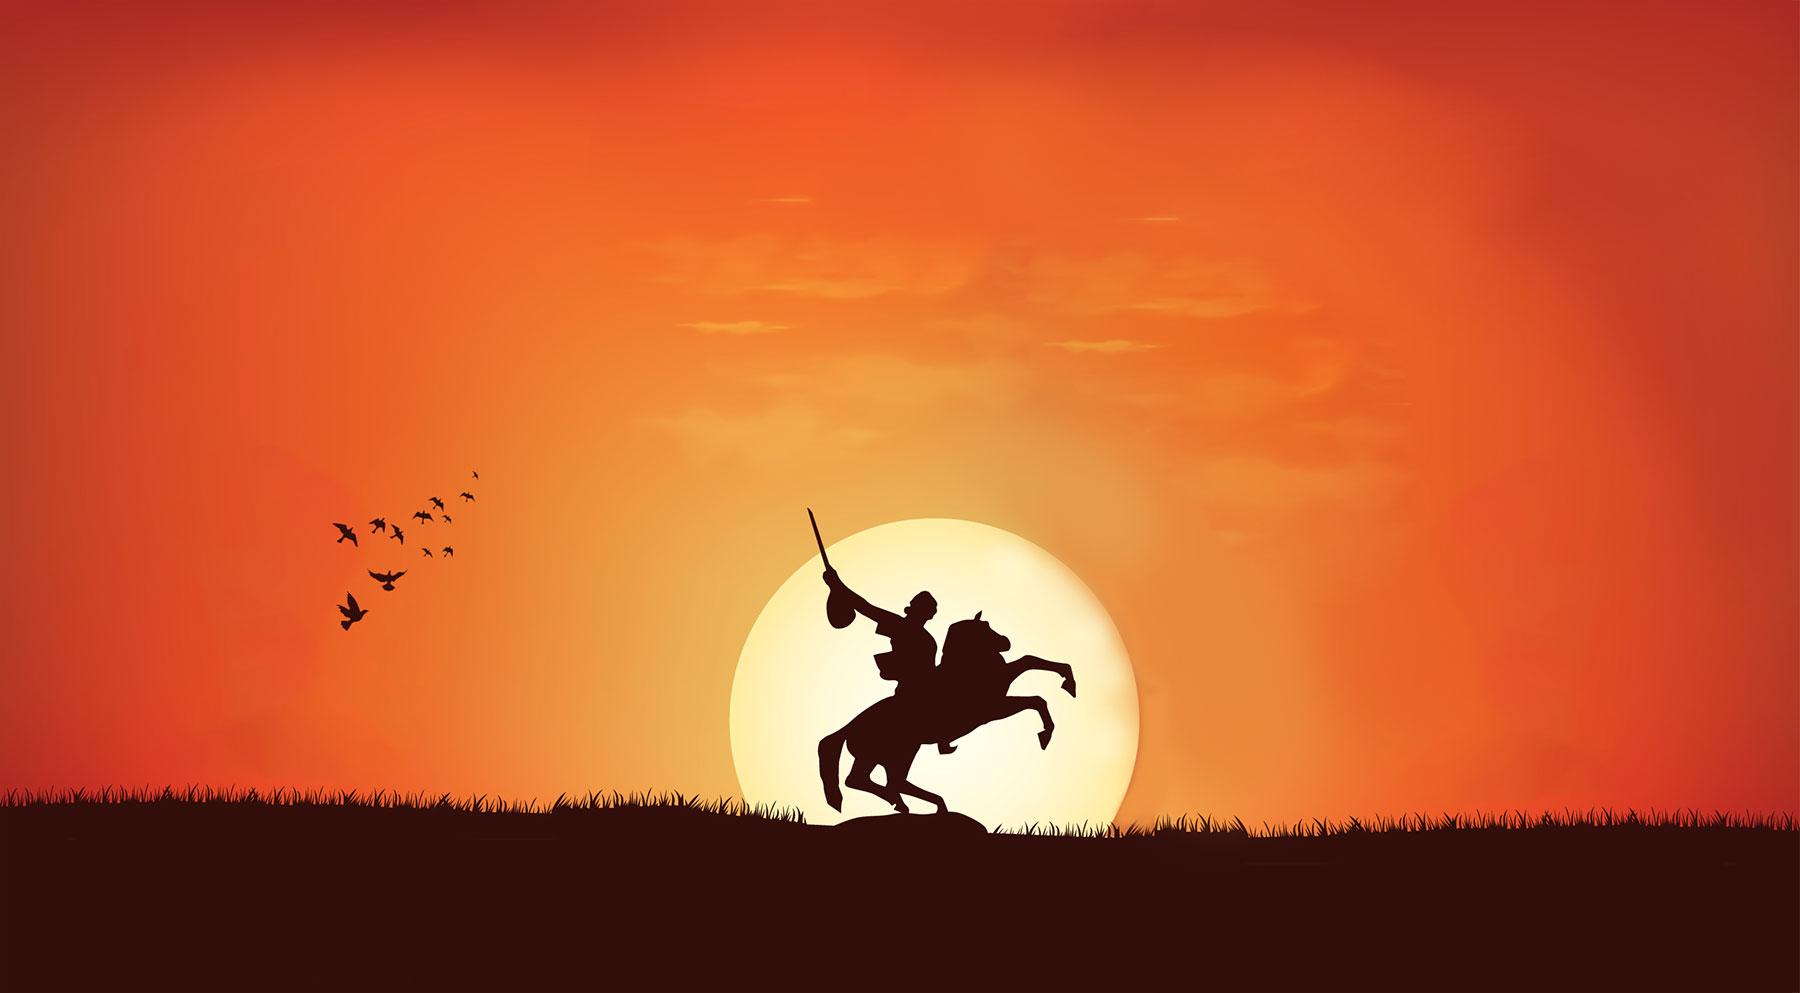 Köroğlu – Der türkische Robin Hood